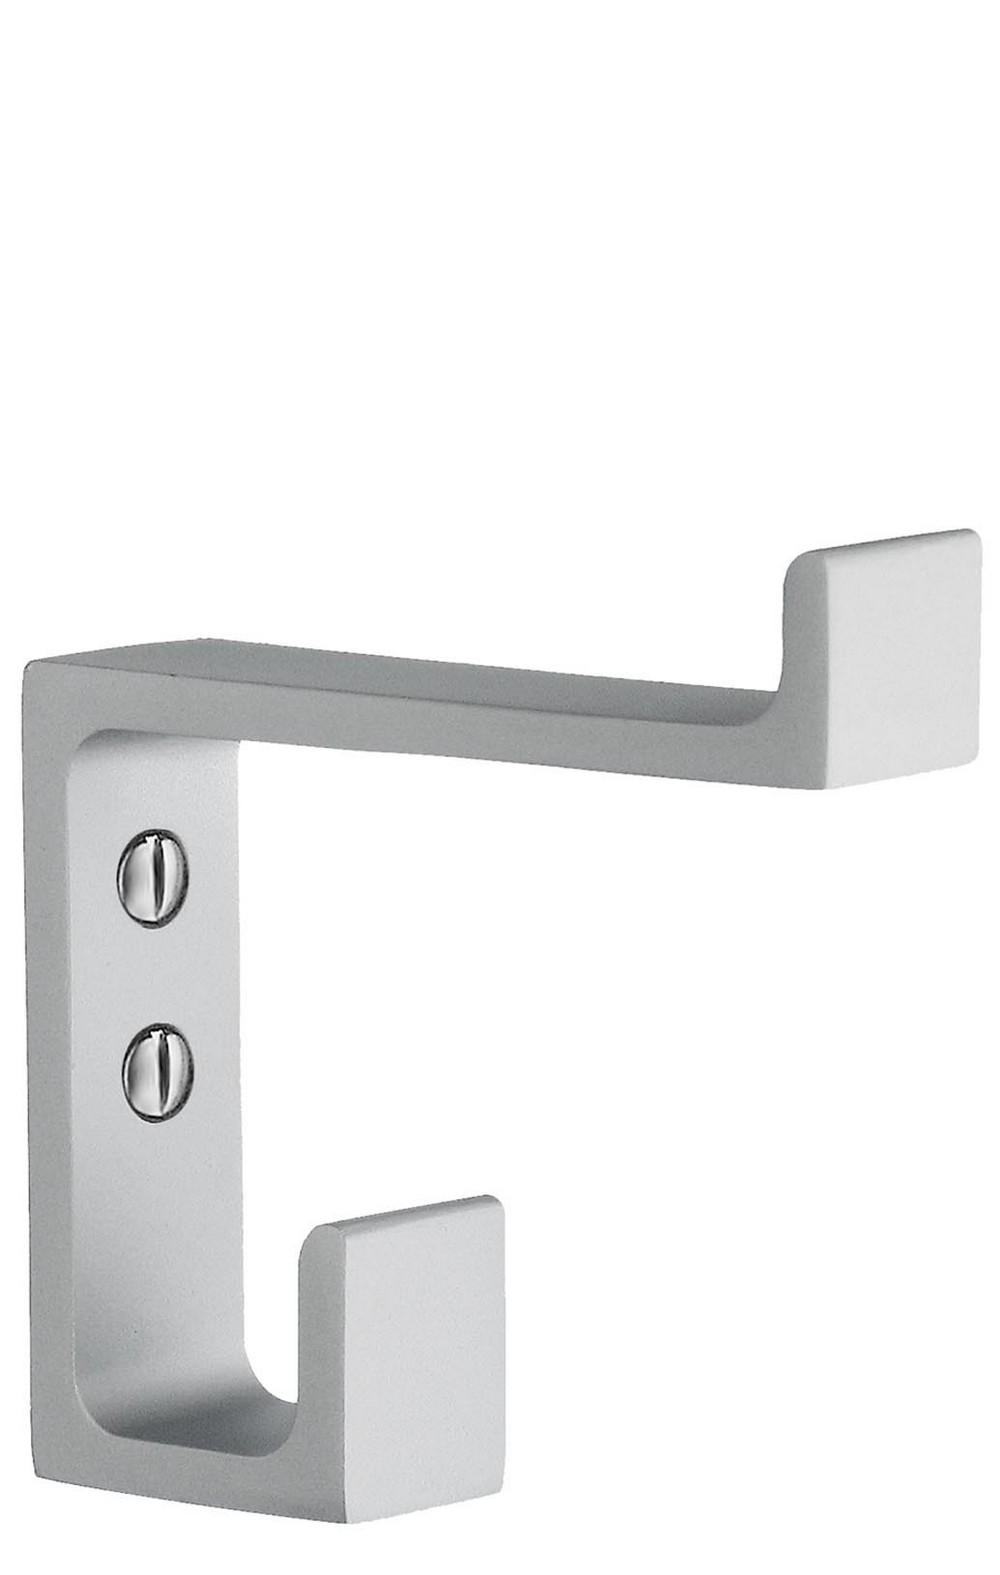 smedbo b coat hook matt aluminum  thebuilderssupplycom - quick view